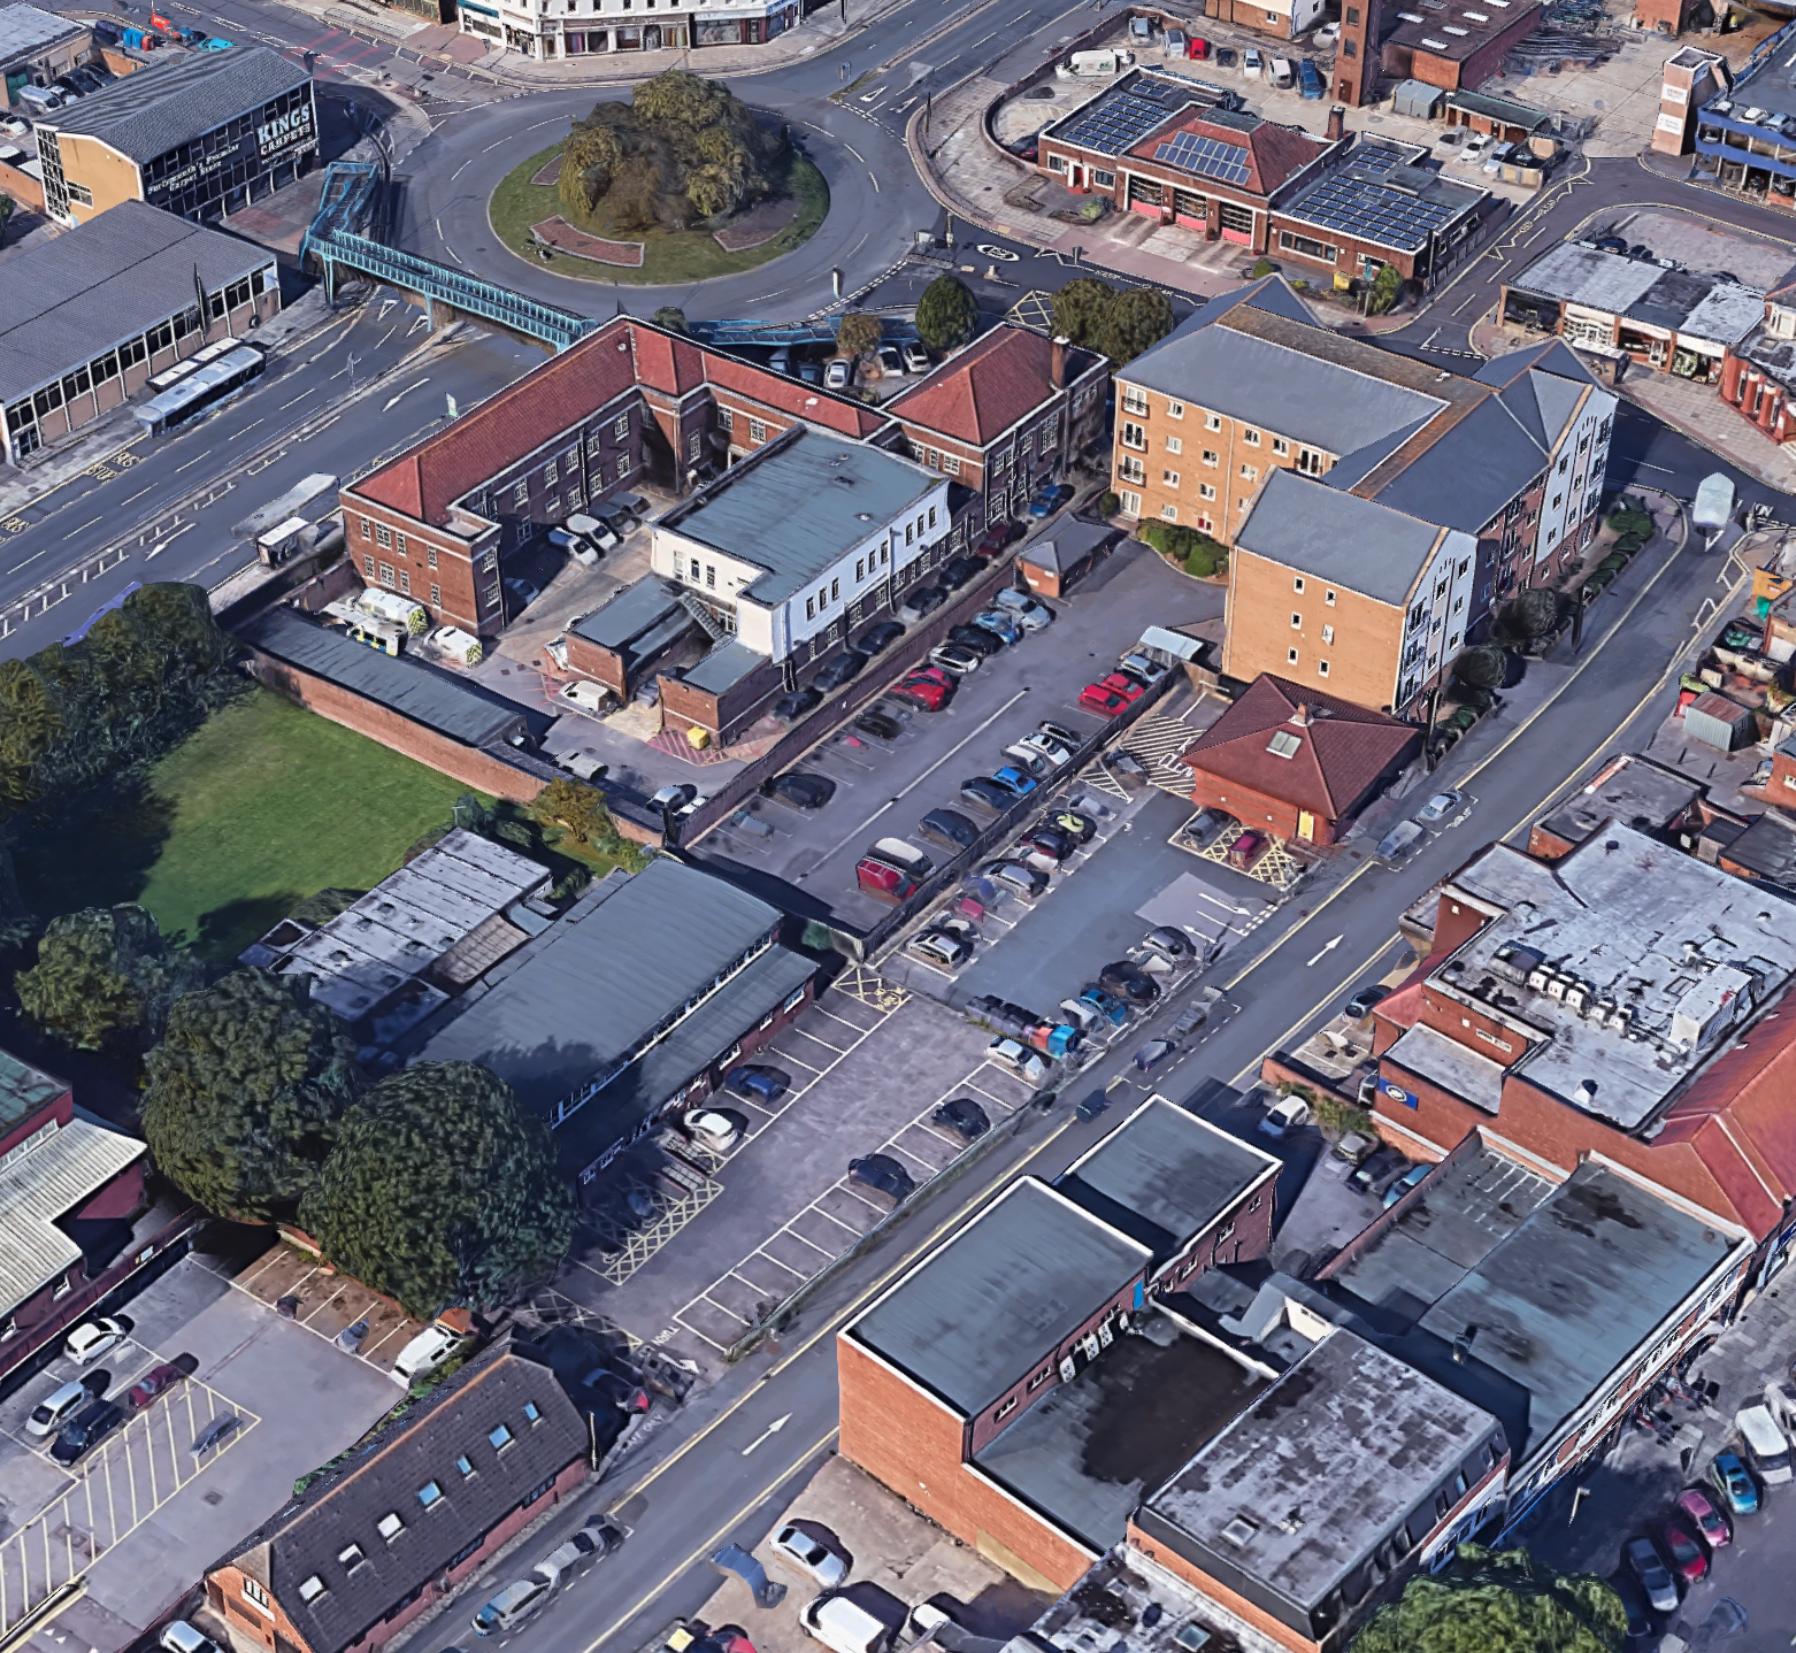 Cosham (Image source: Google Maps)